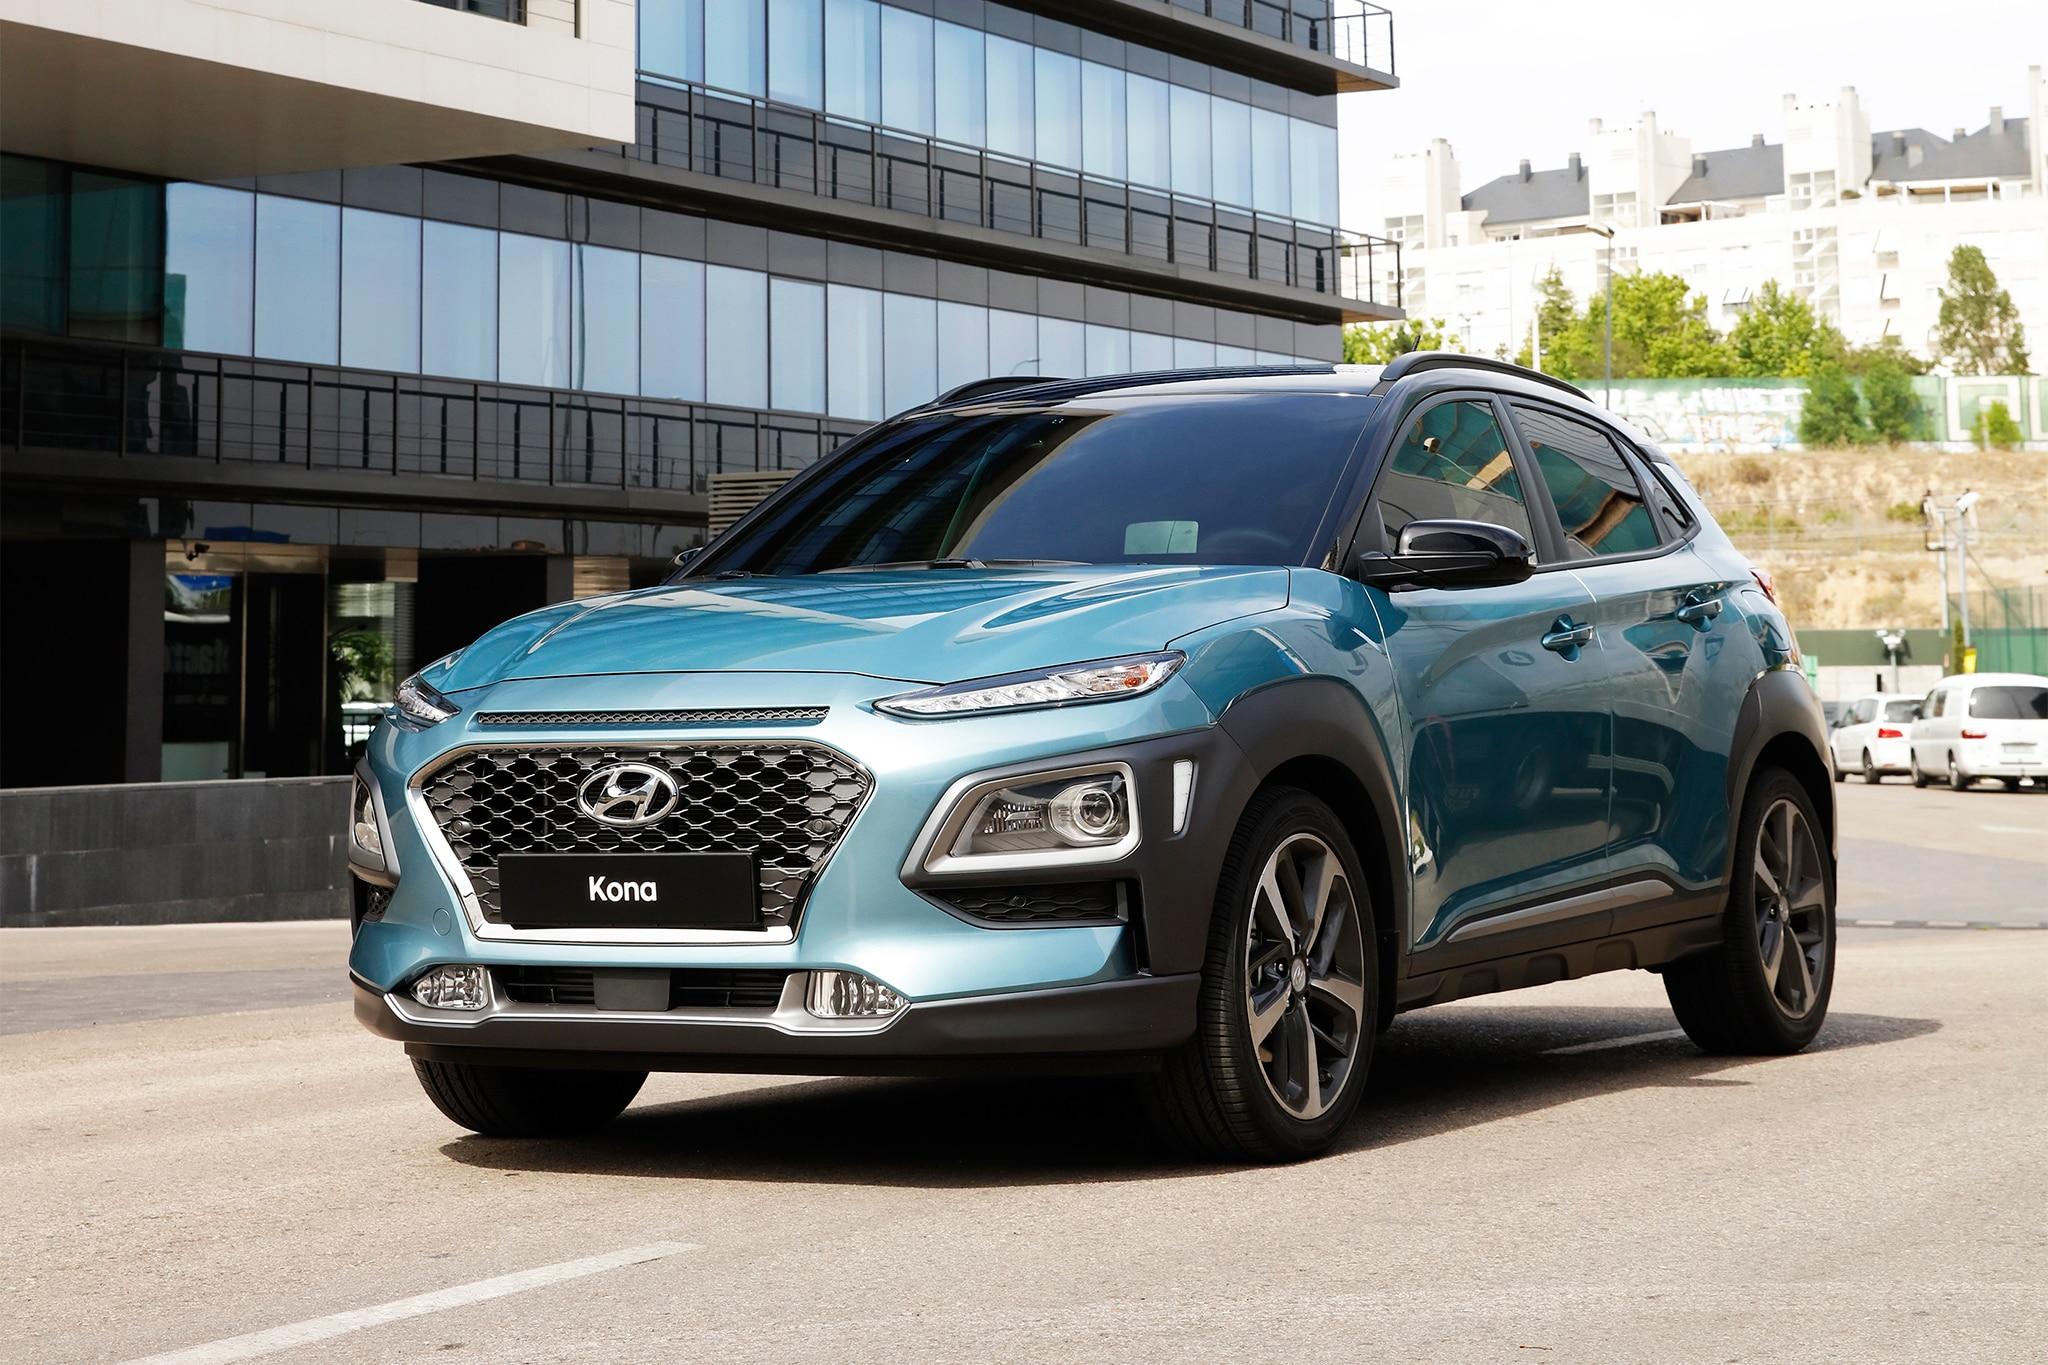 2018 Hyundai Kona Front Three Quarter 01